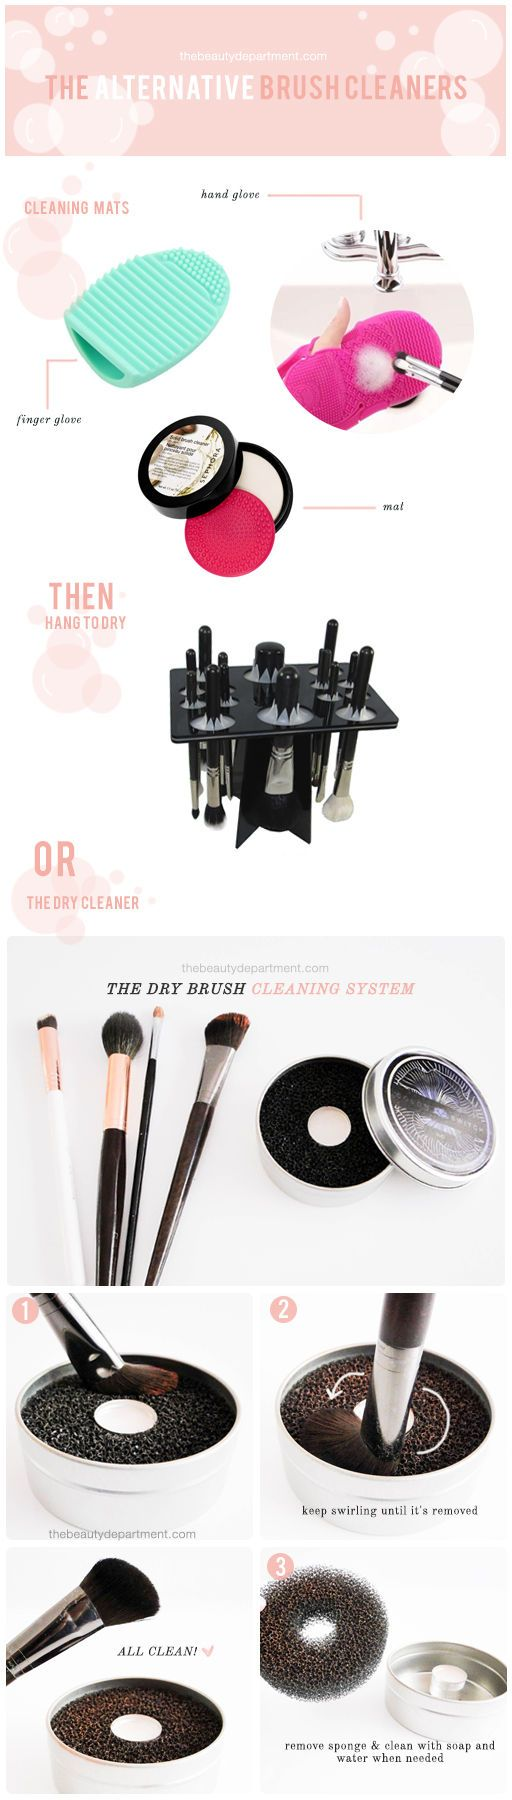 Makeup Brush Cleaning Sponge No Water Needed